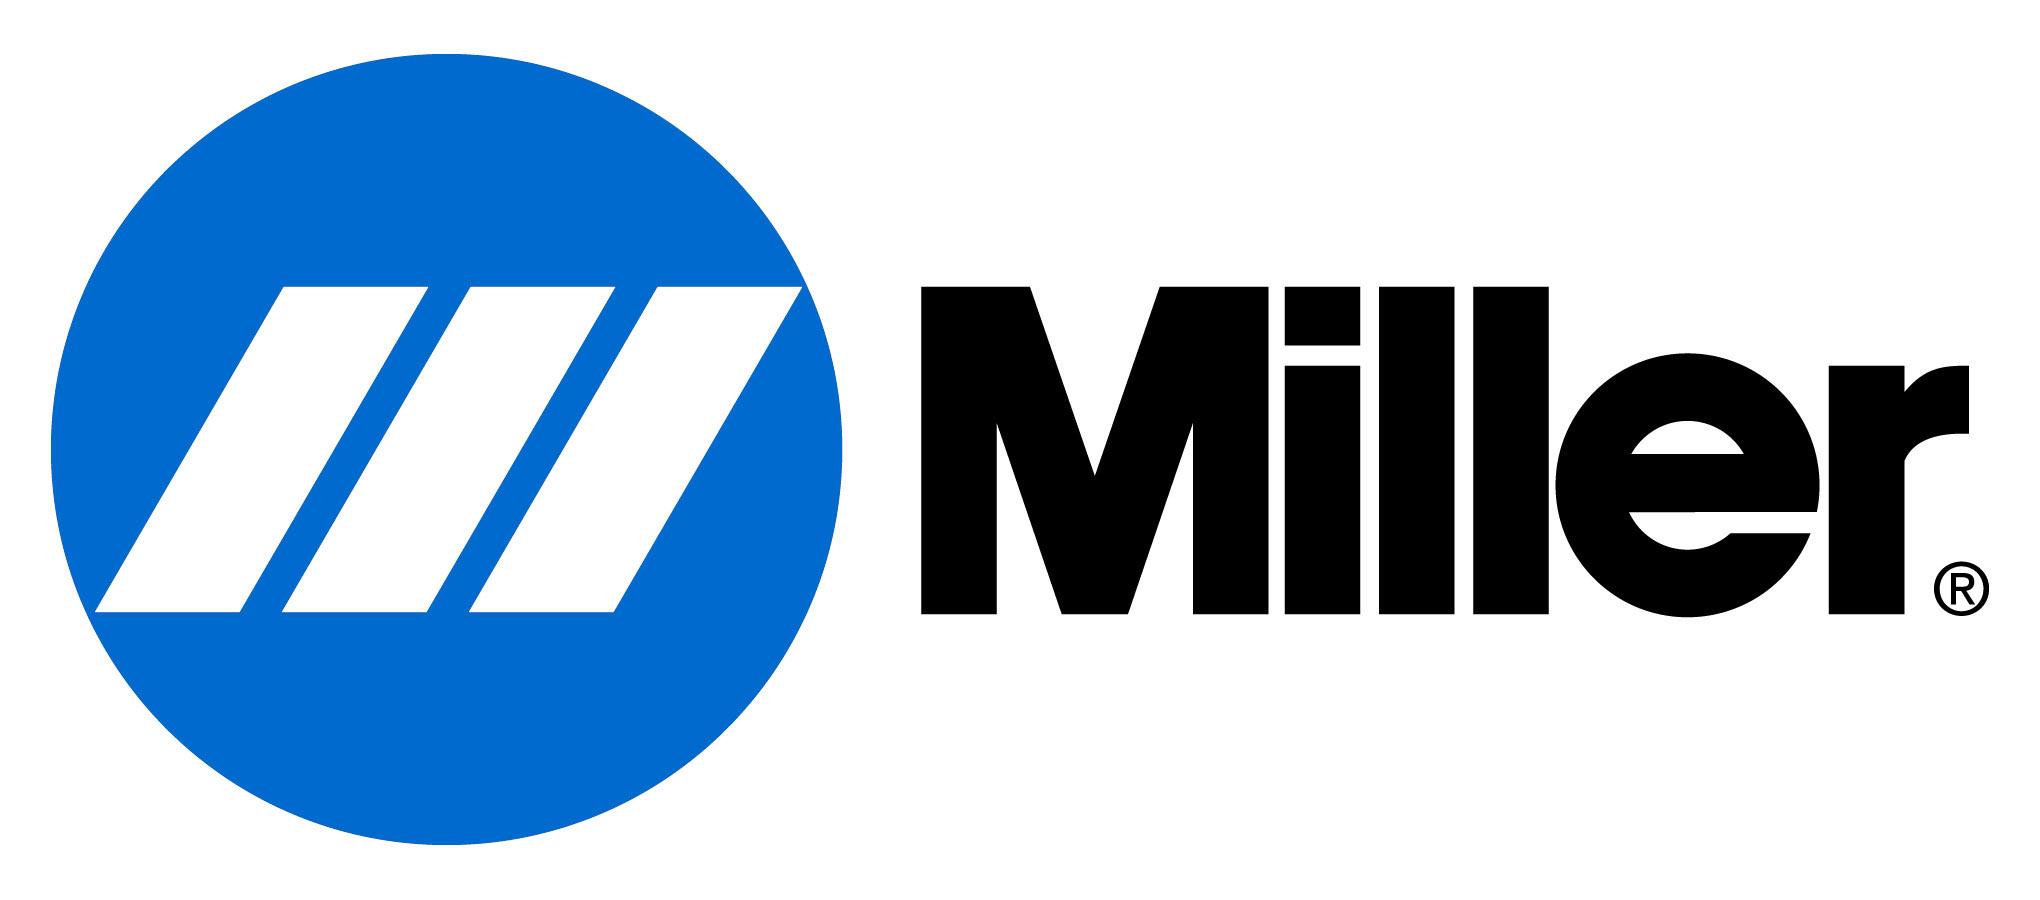 used miller welding equipment for sale refurbished with warranty rh westermans com welding logo's welding logos designs